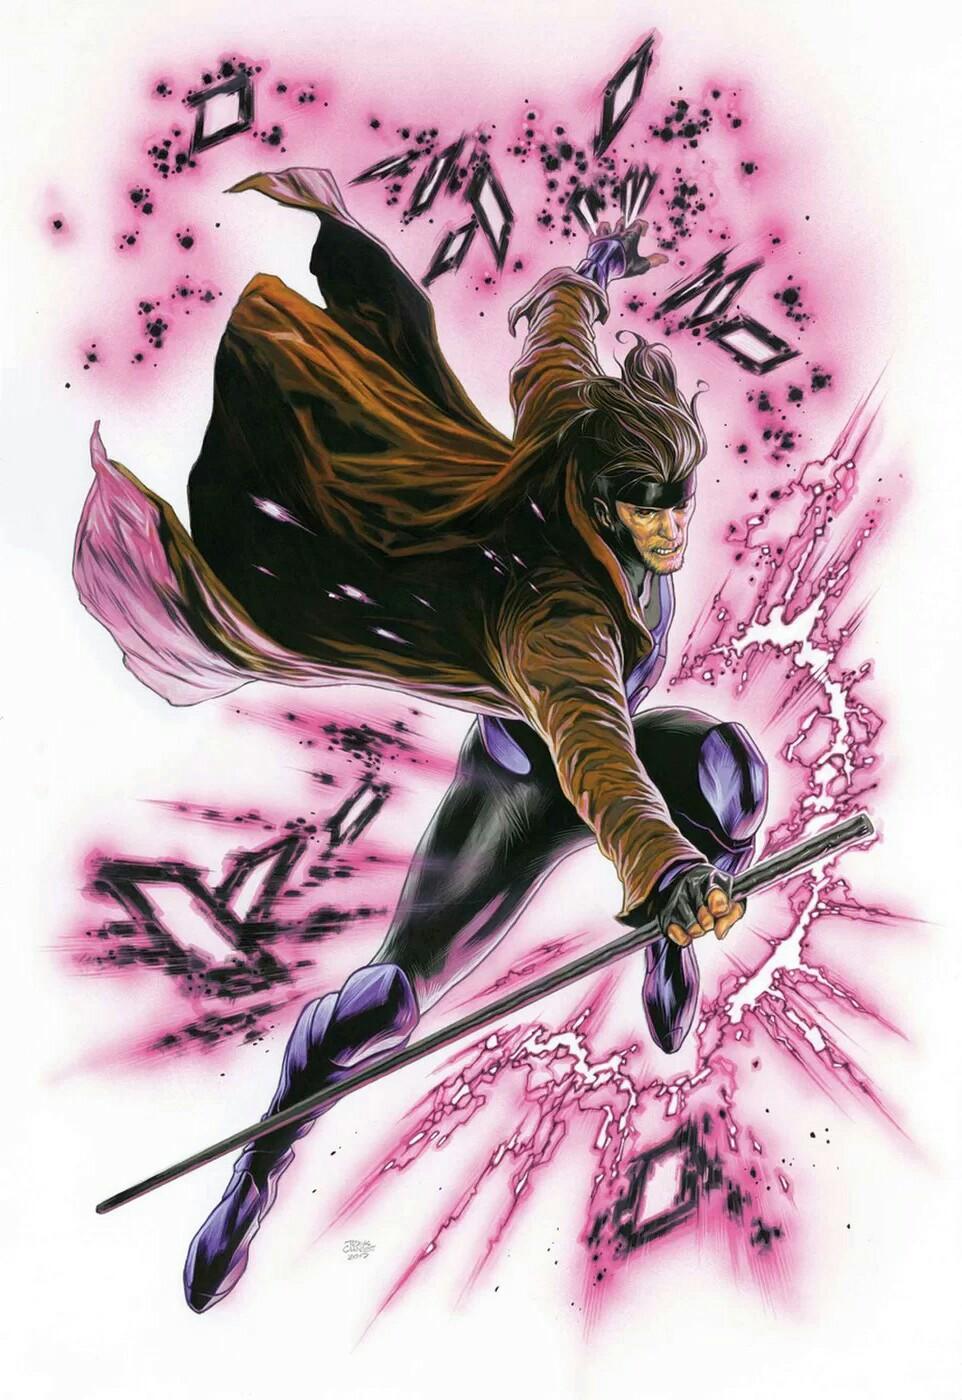 Remy LeBeau (Earth-616) | Marvel Database | FANDOM powered